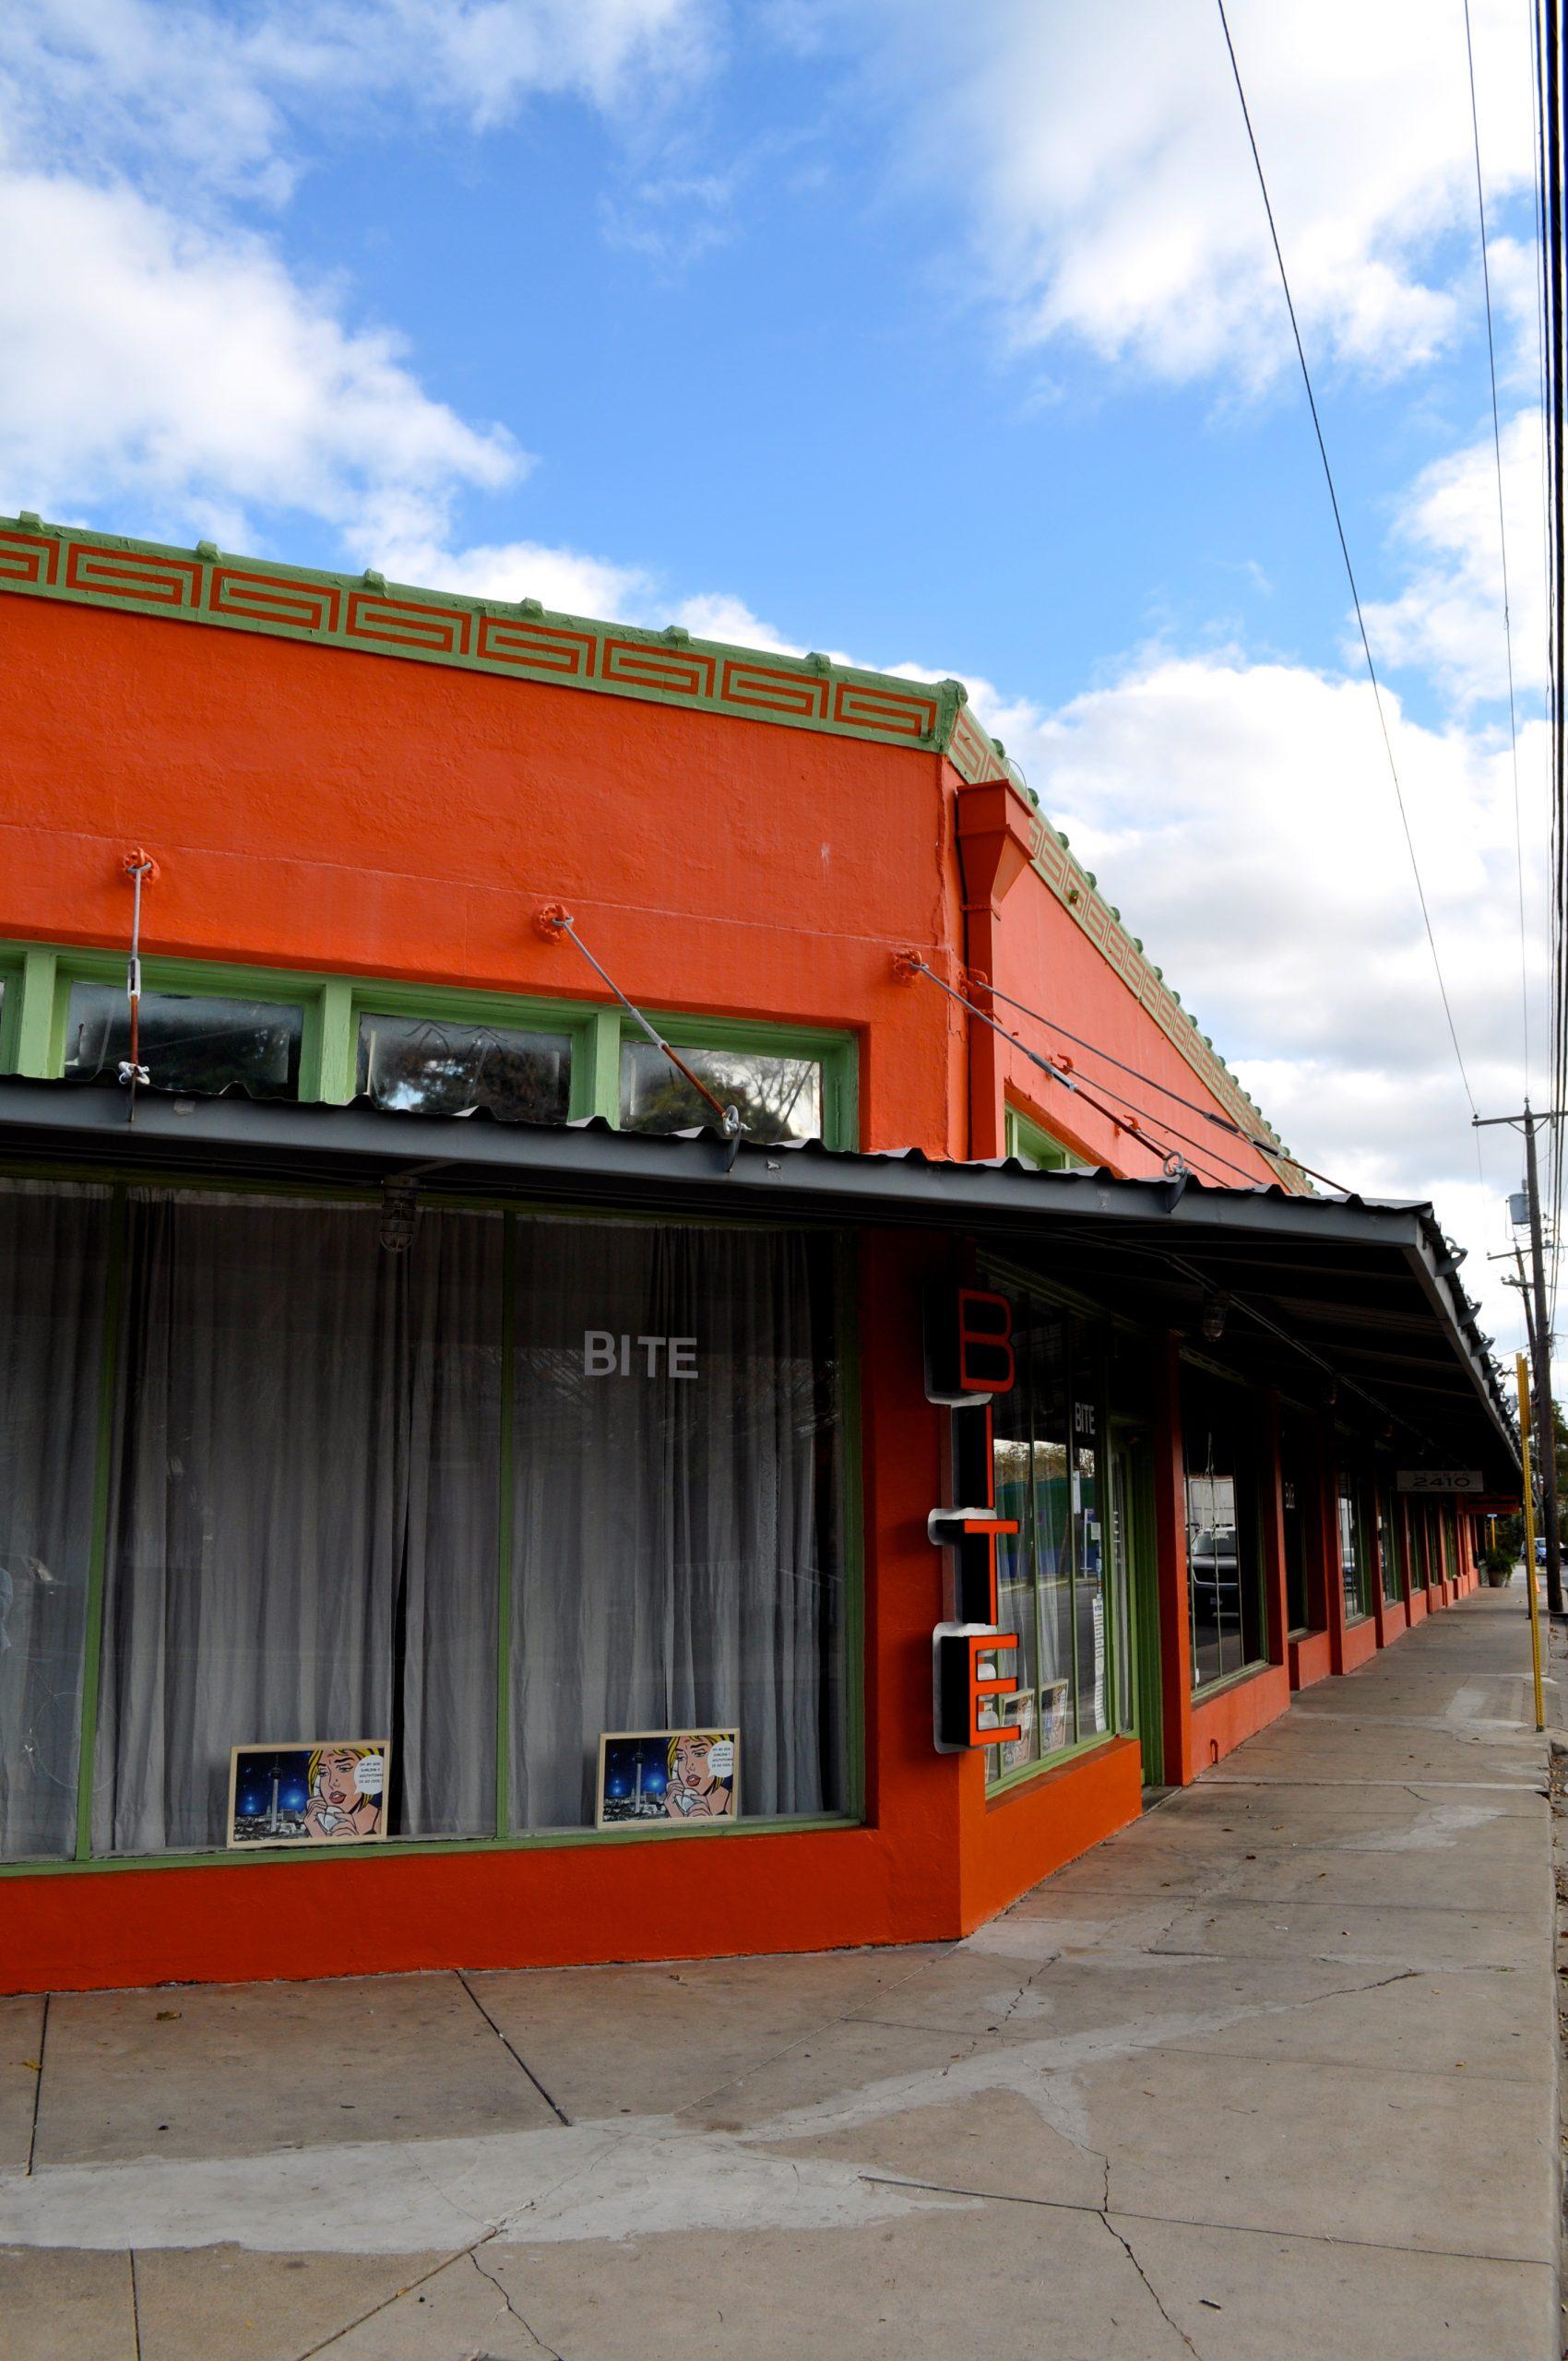 Bite Restaurant in Southtown, San Antonio. Photo by Iris Dimmick.